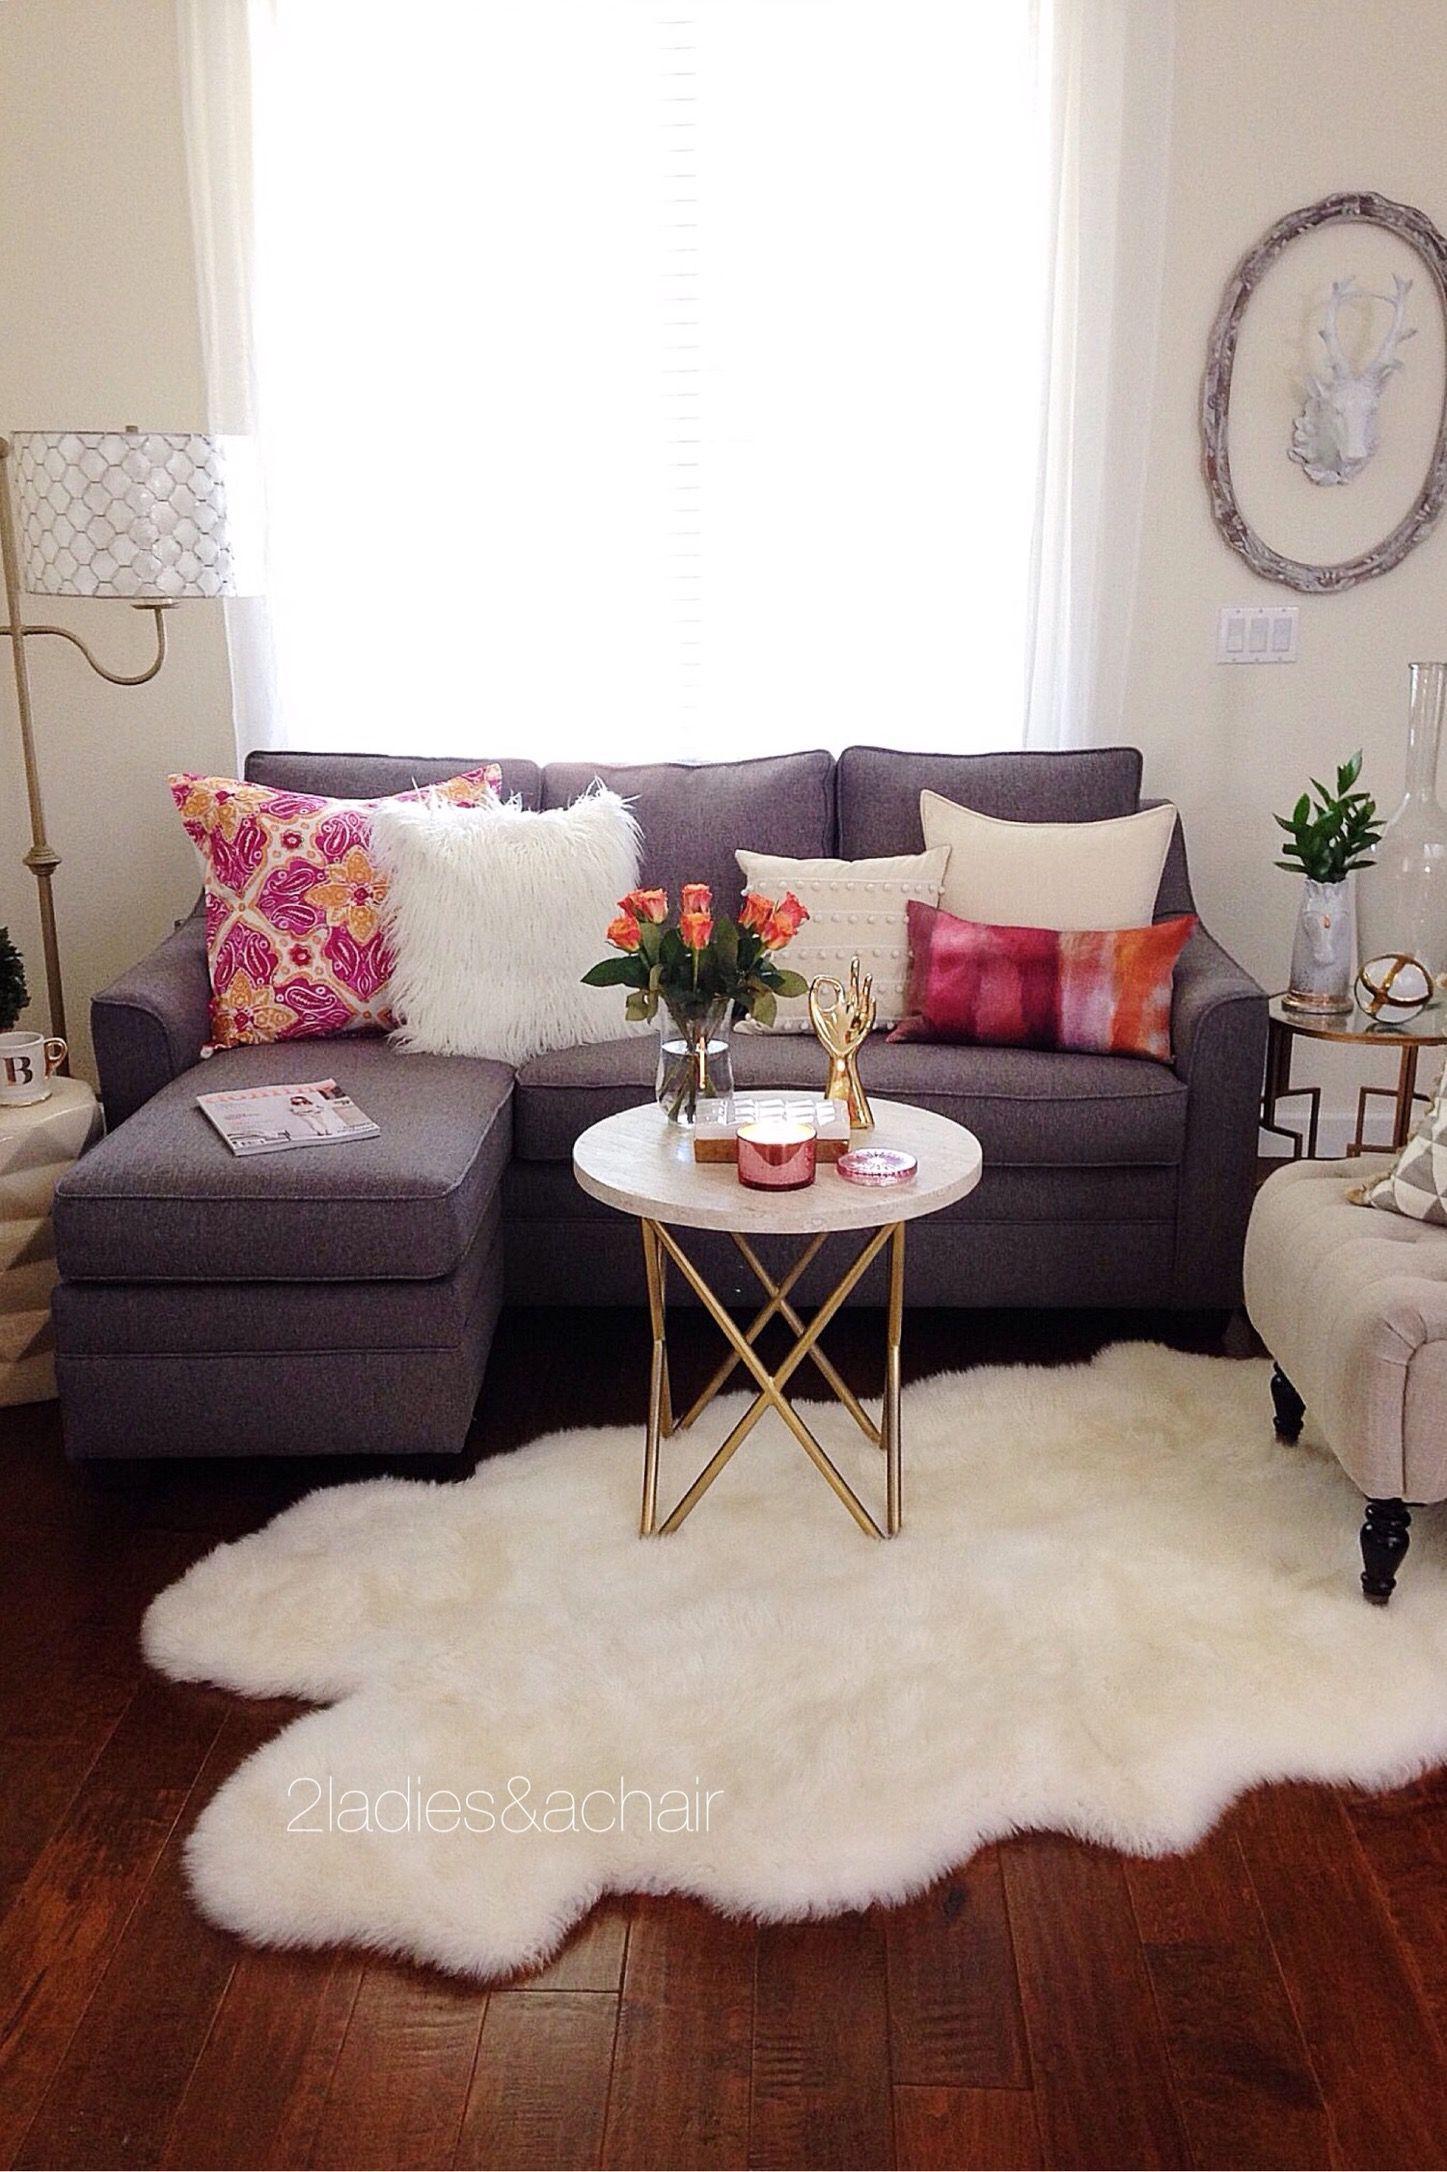 Amazing Picture Of Girl Apartment Ideas Apartment Decor Inspiration Apartment Living Room Small Apartment Decorating